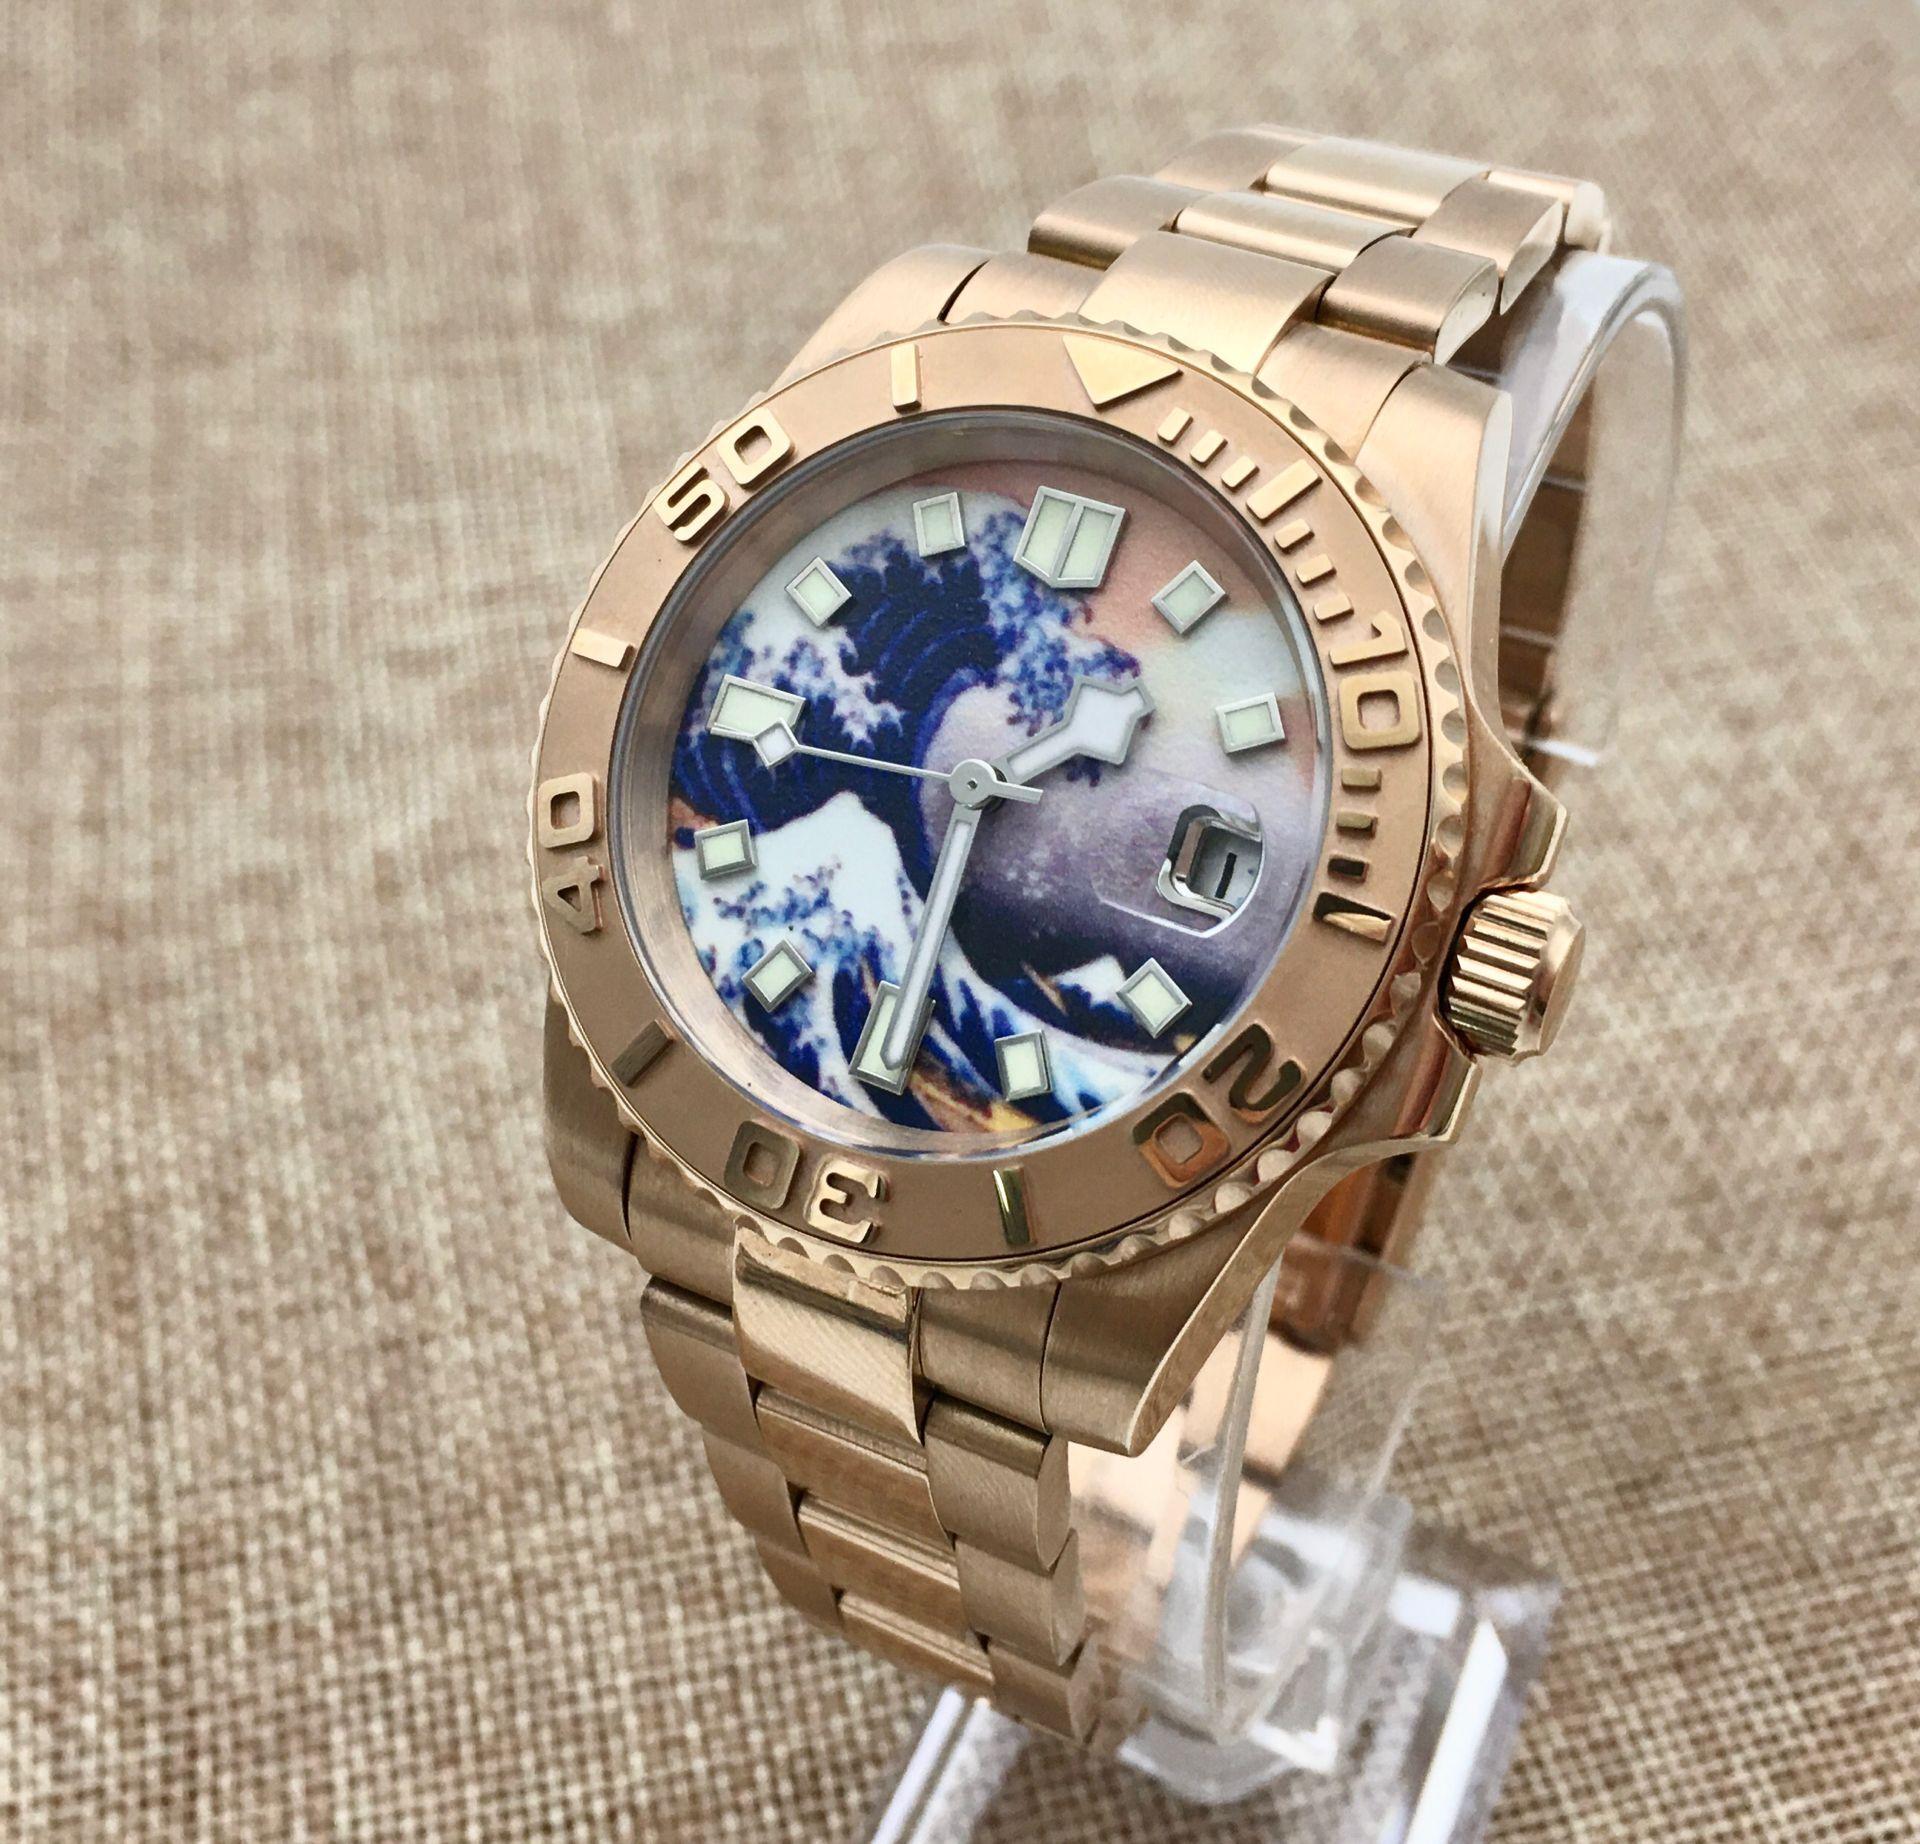 40mm Kanagawa Surf Luminous Dial Ceramic Ring Yacht Men's Automatic Mechanical Watch Stainless Steel Rose Gold Case enlarge